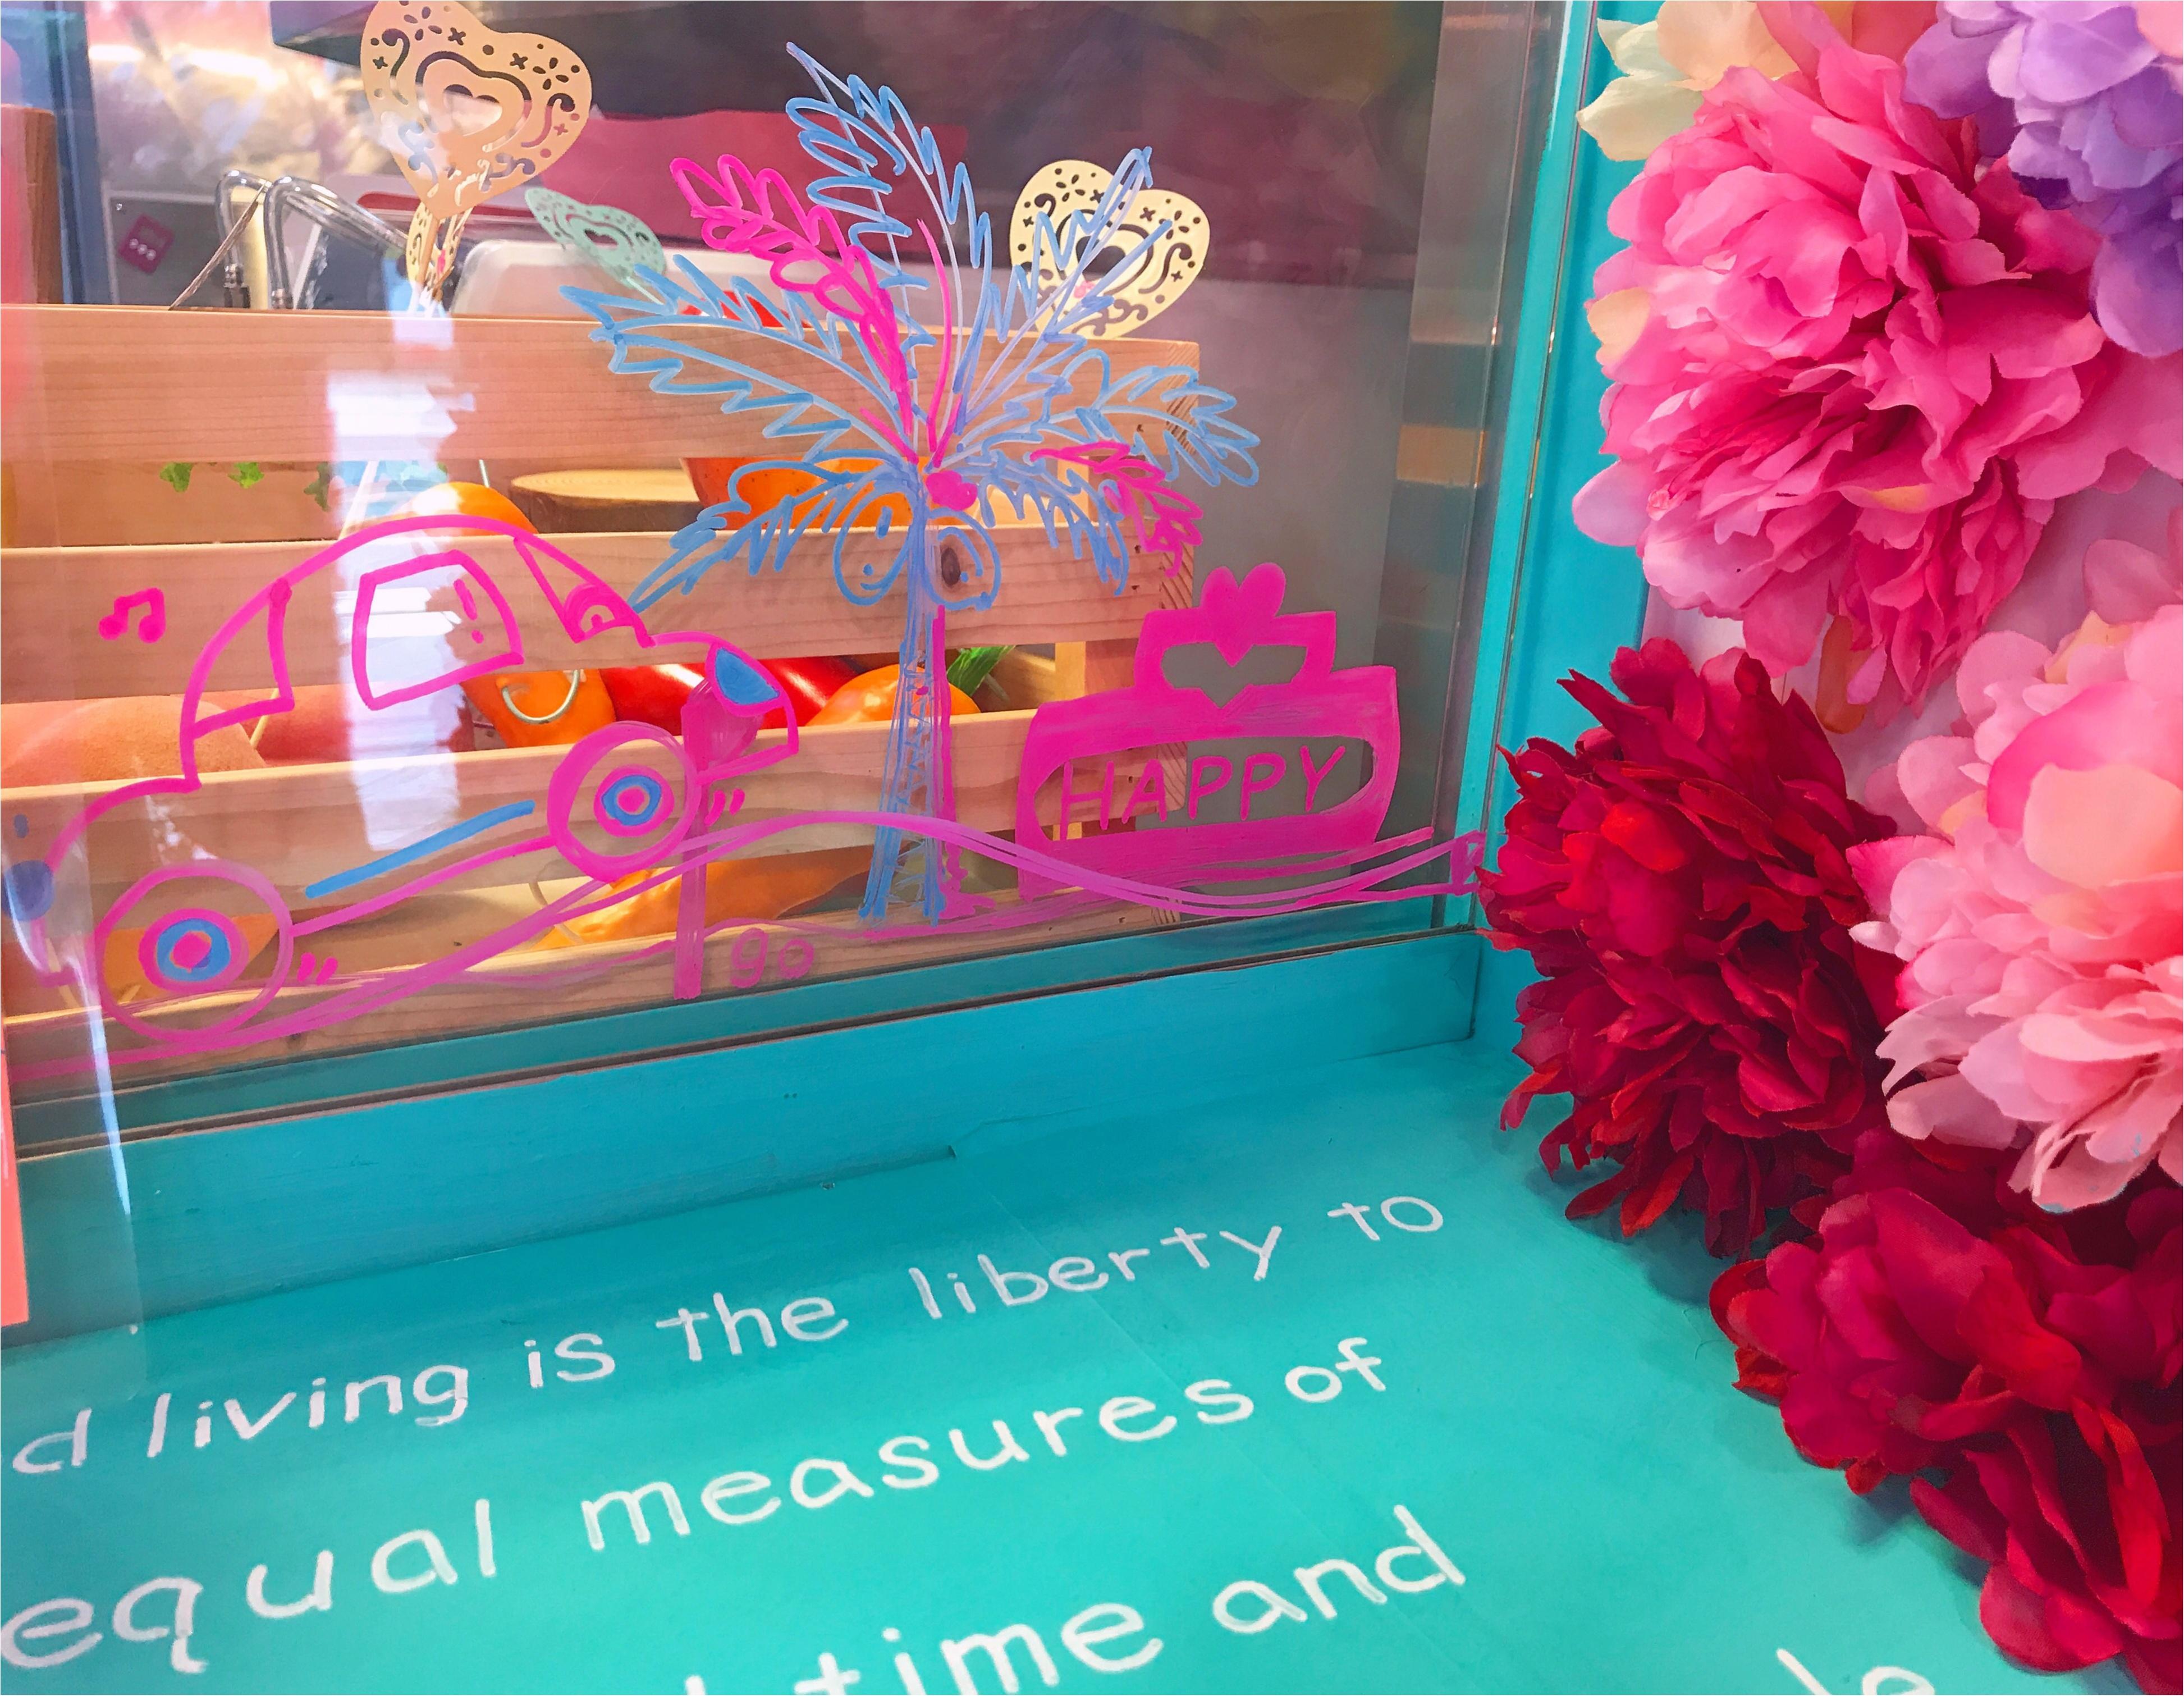 【FOOD】沖縄で人気のカフェが池袋に♡!これから流行る!\LA❤︎Hotdogs Factory/_8